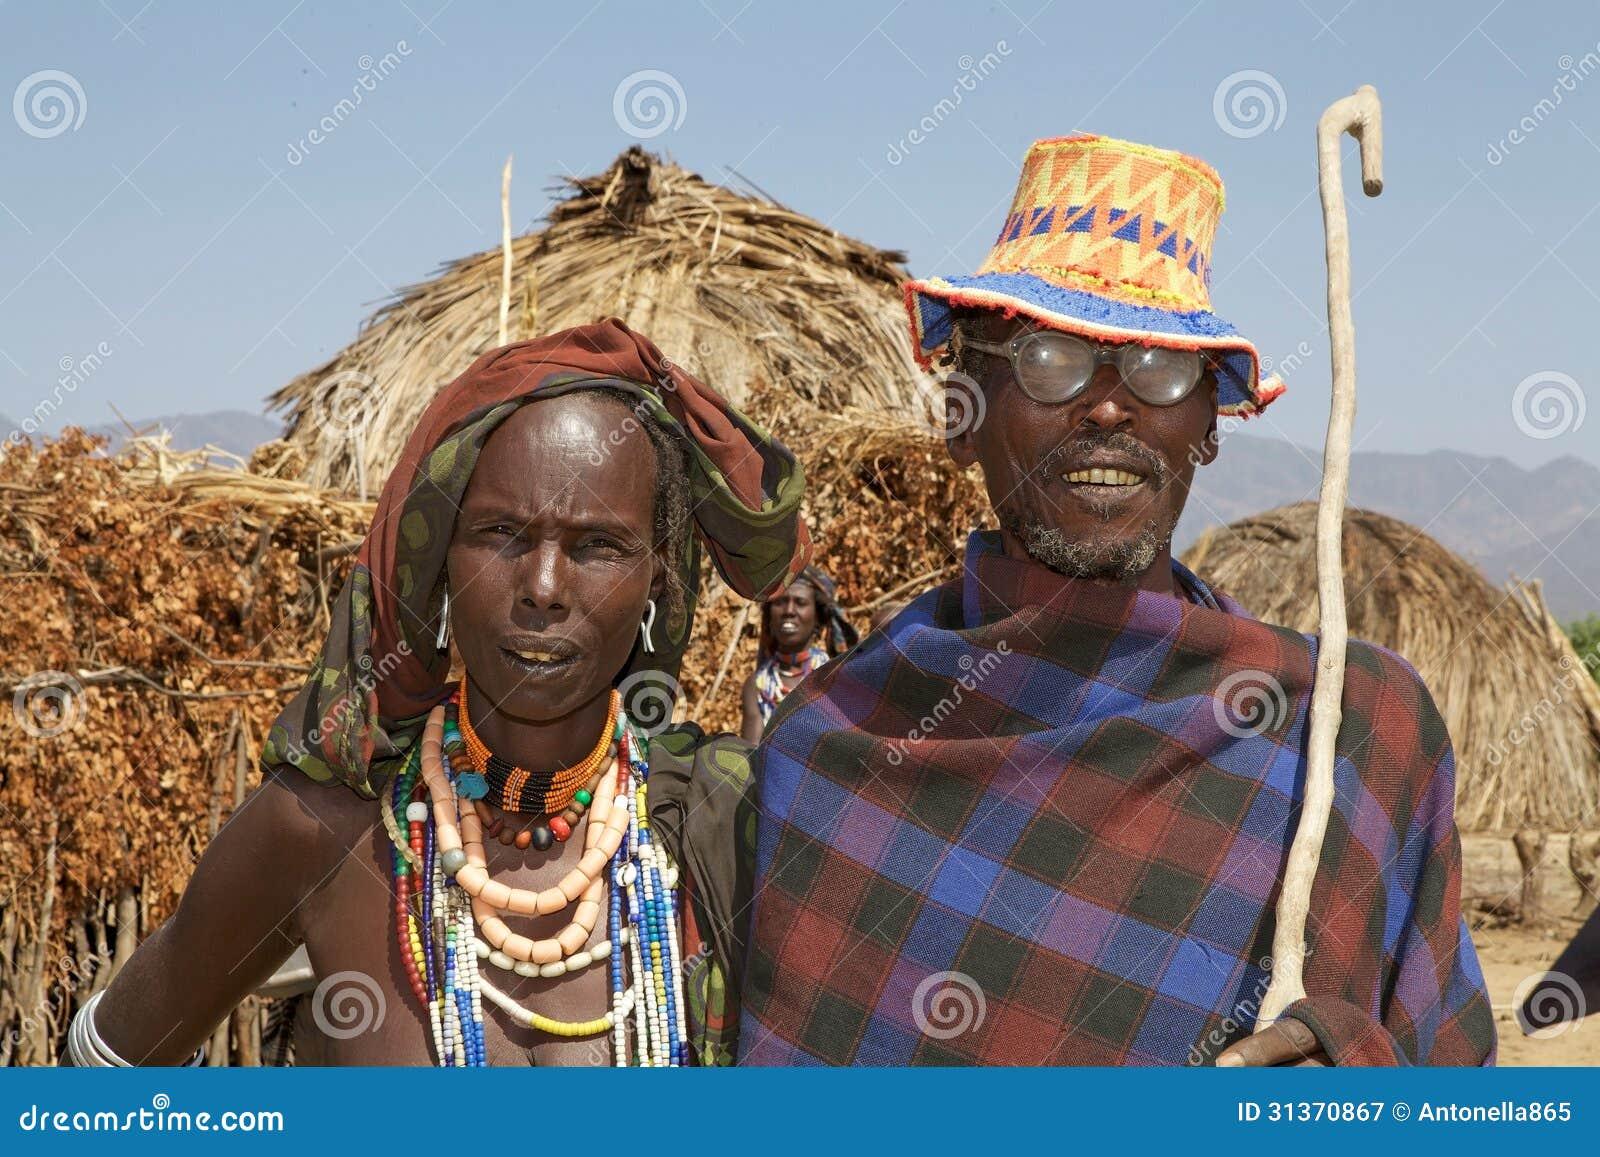 Afrika frauen dating